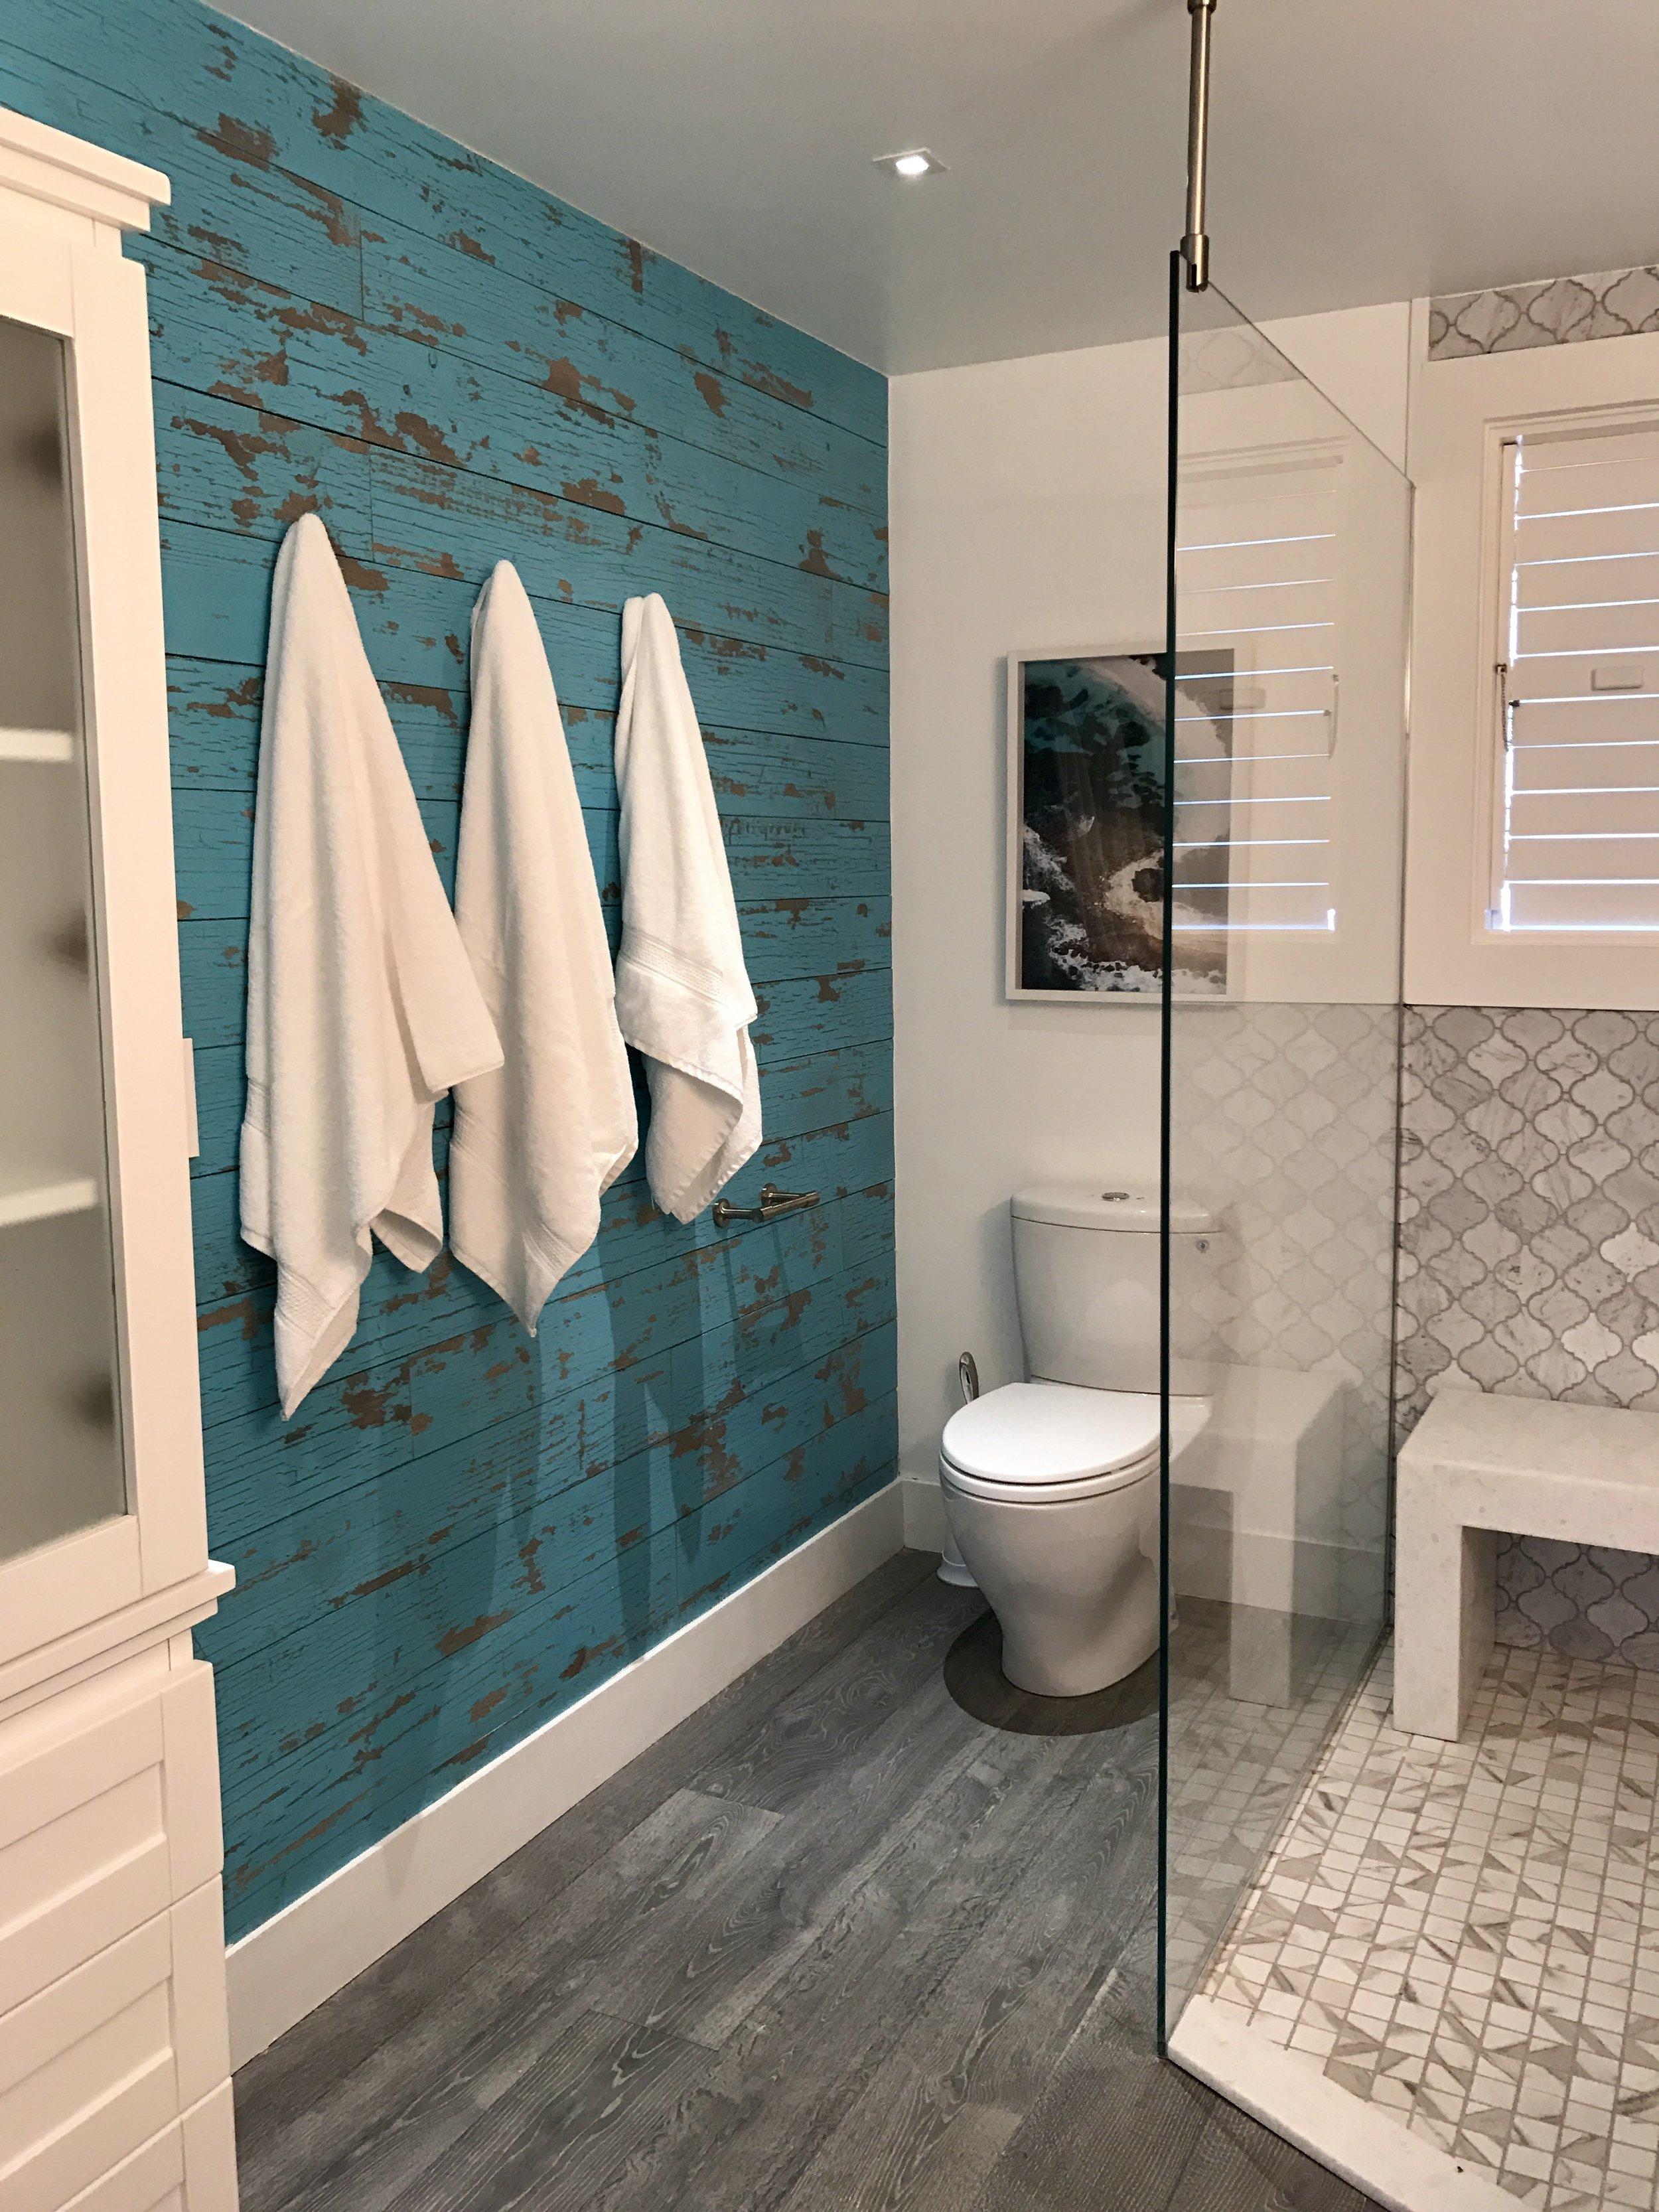 Bathroom designed and styled by Charmaine B Werth. Photo courtesy of Charmaine B Werth